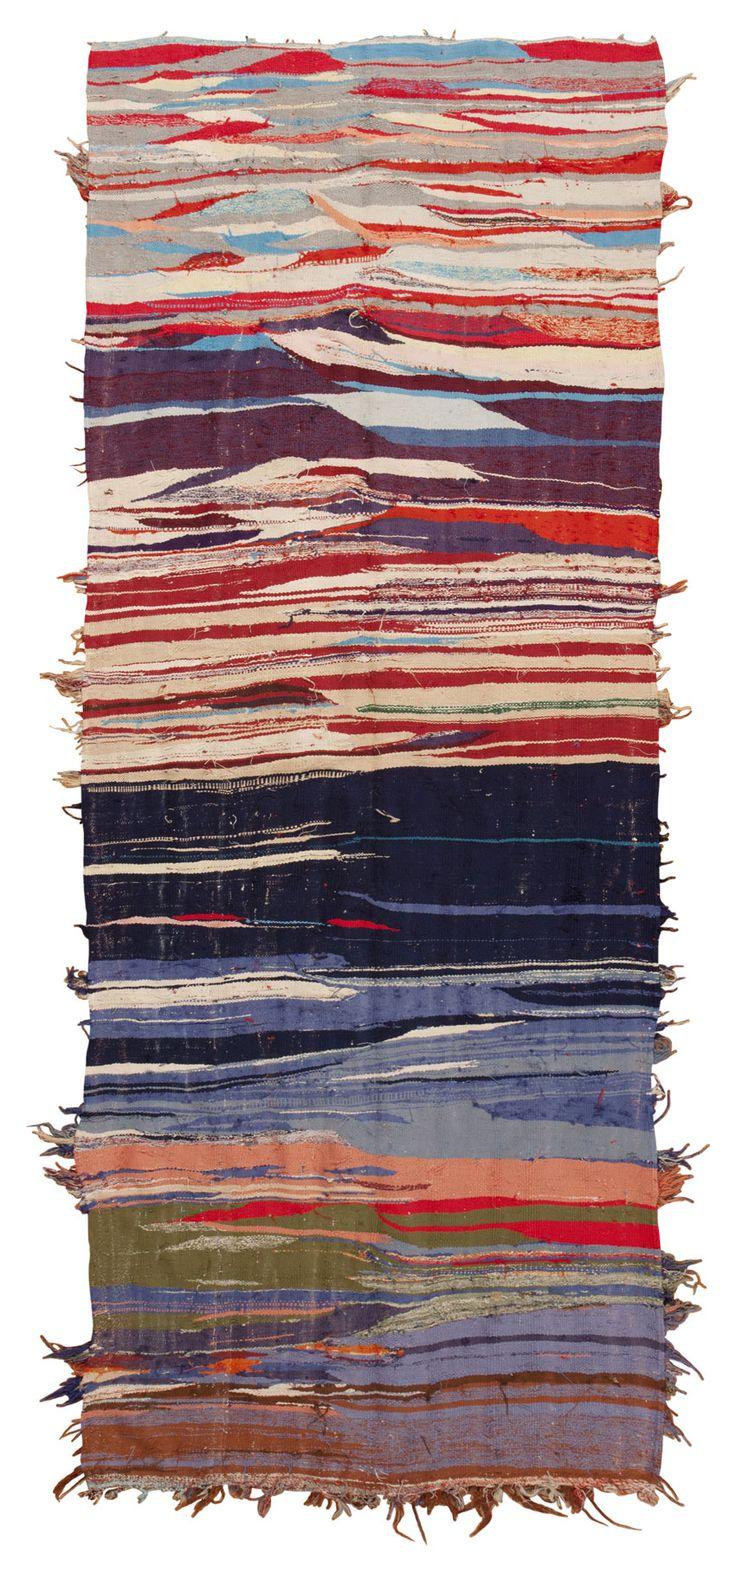 # Tapis marocain # # millésime # années 50 # textile